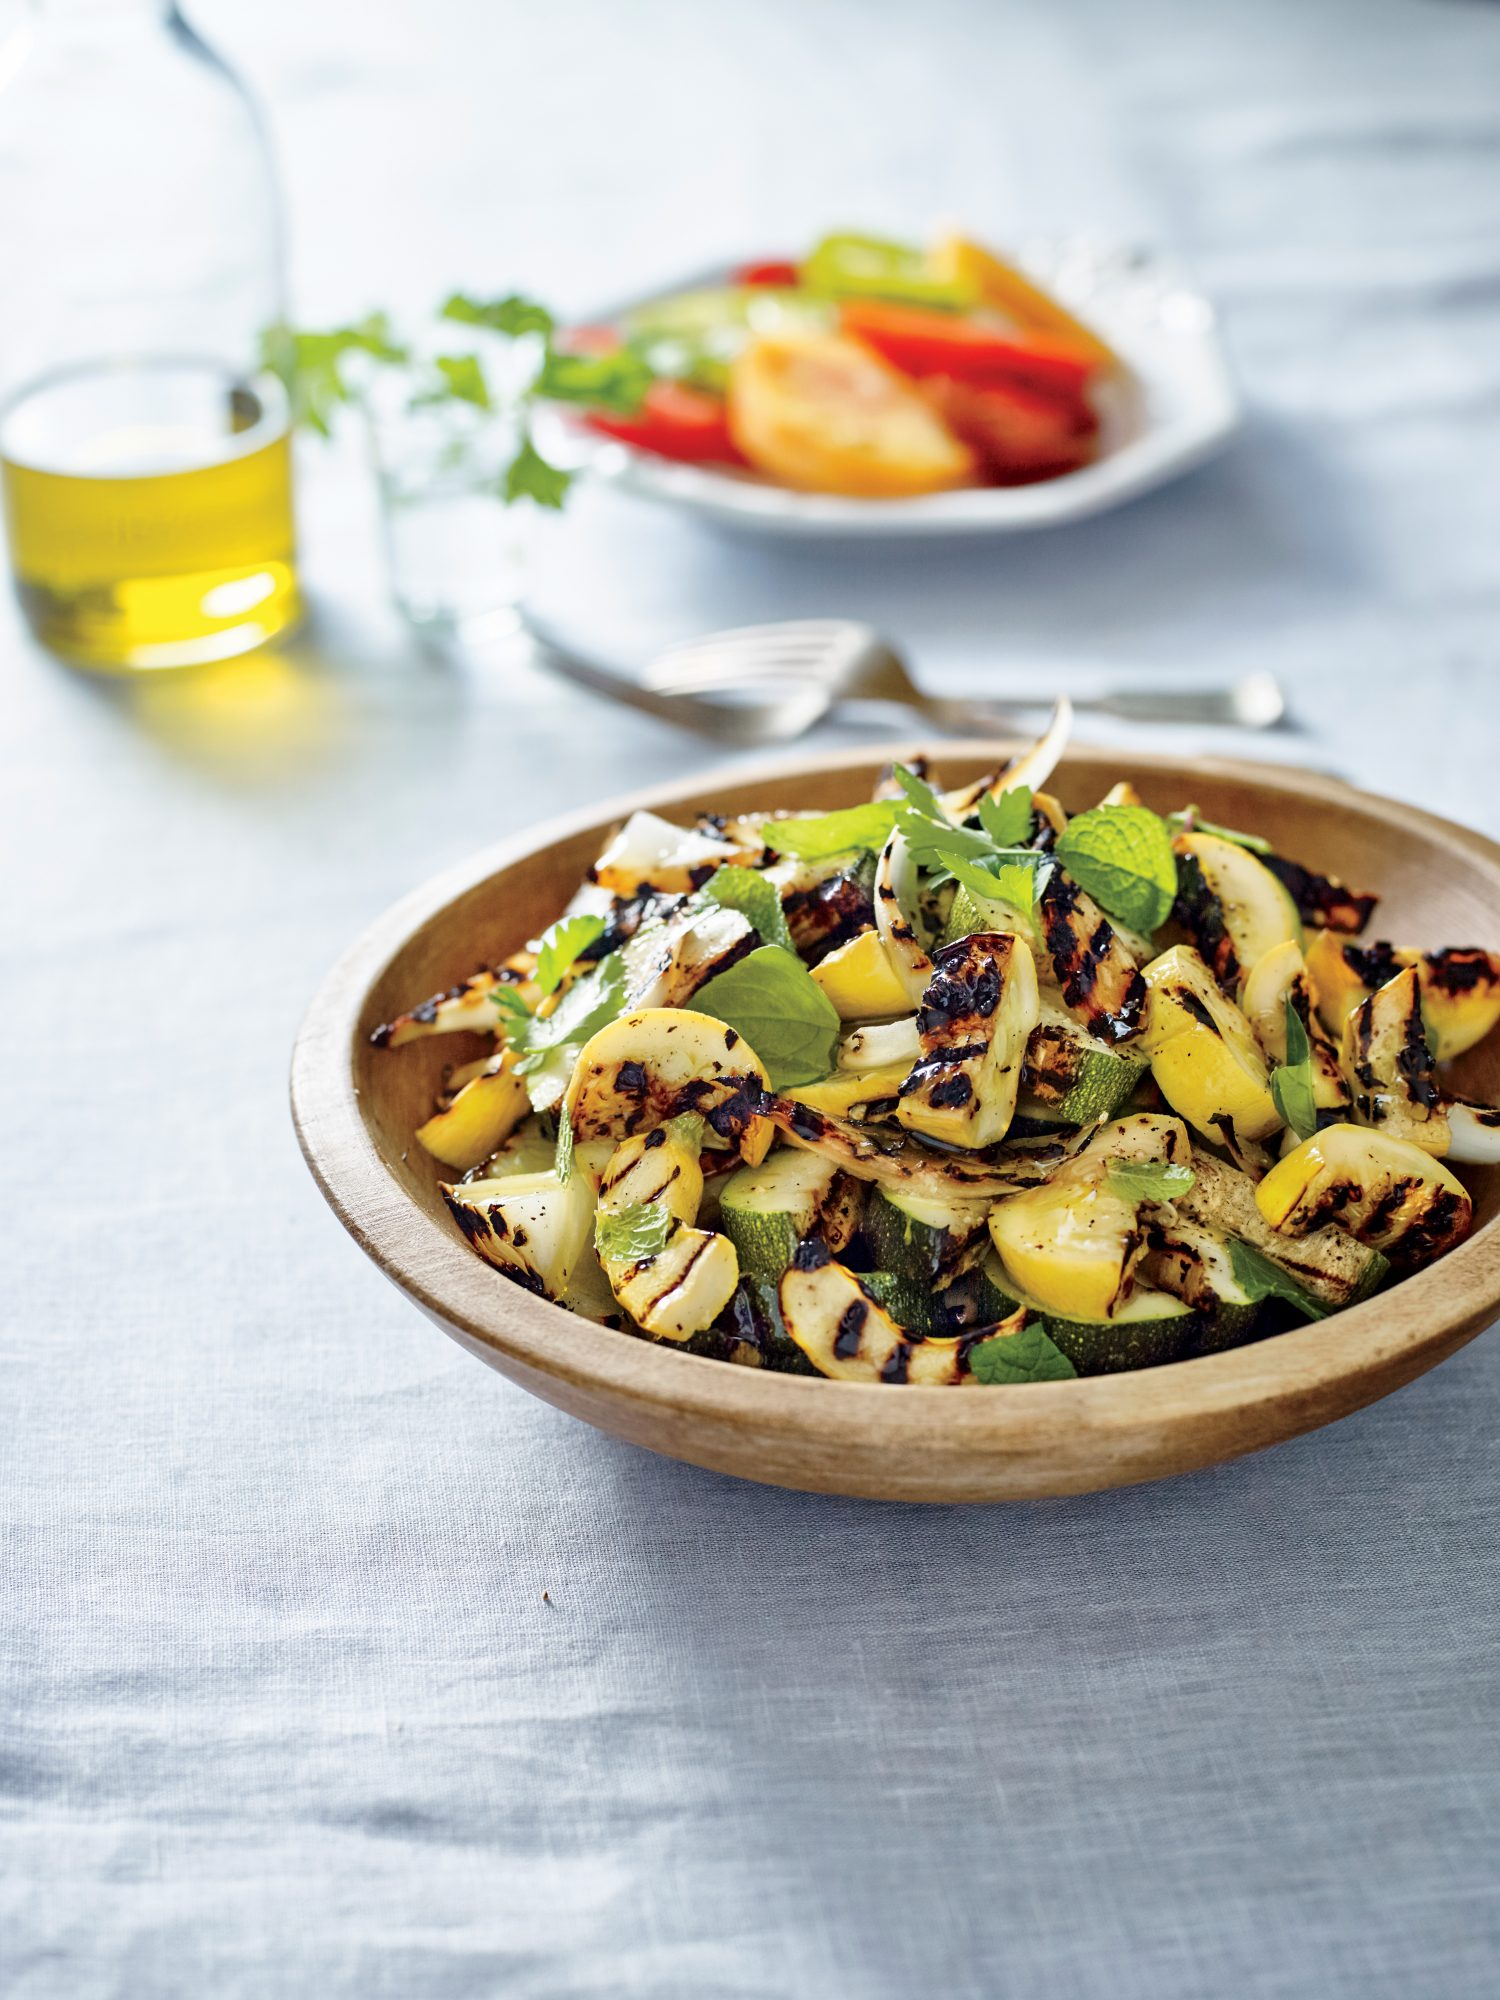 Charred Squash Salad